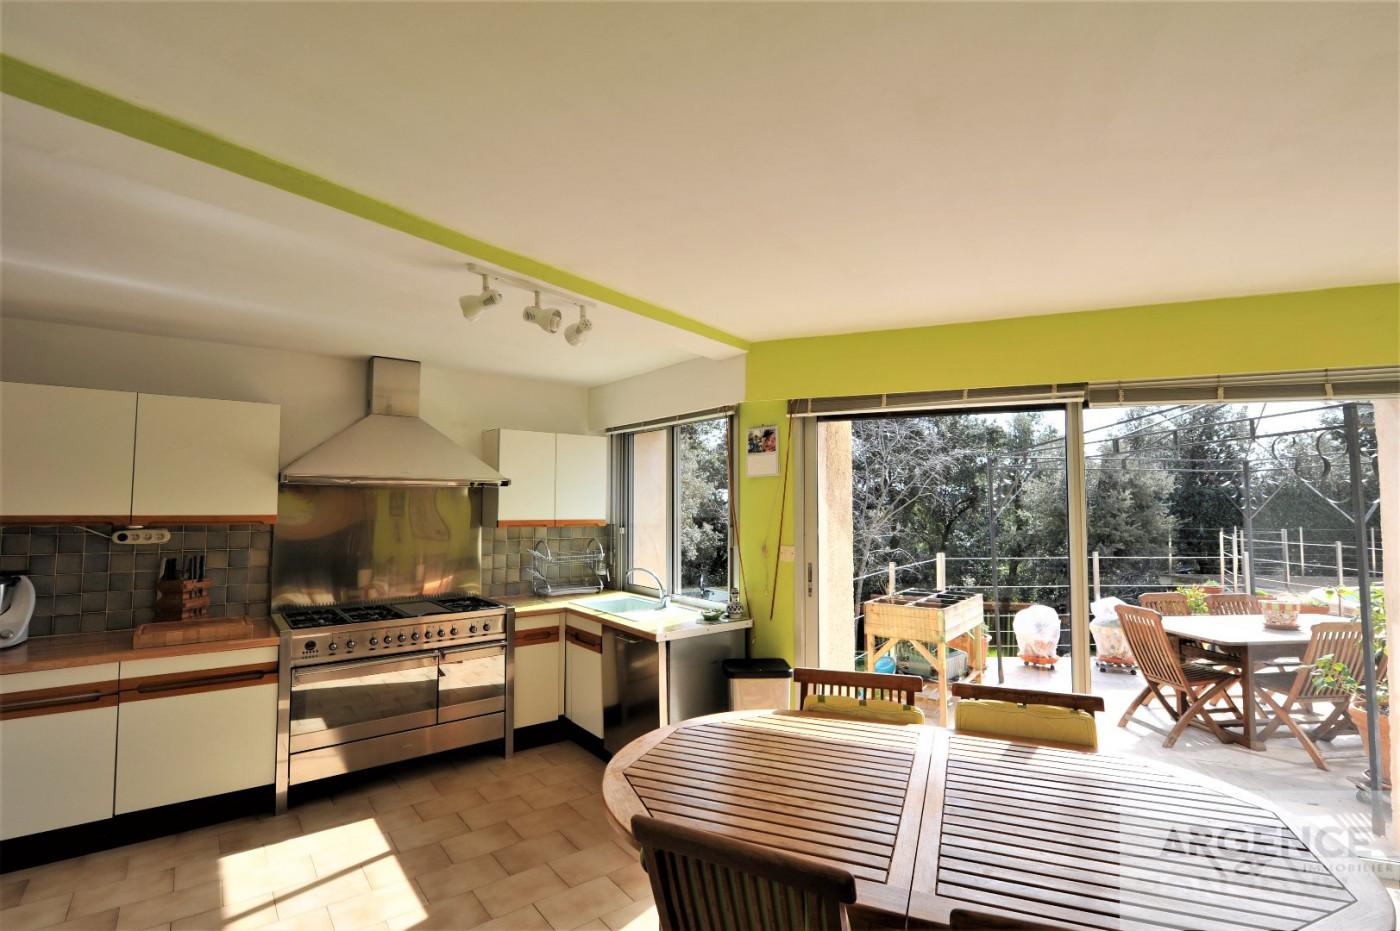 A vendre  Cournonsec | Réf 345335709 - Argence immobilier